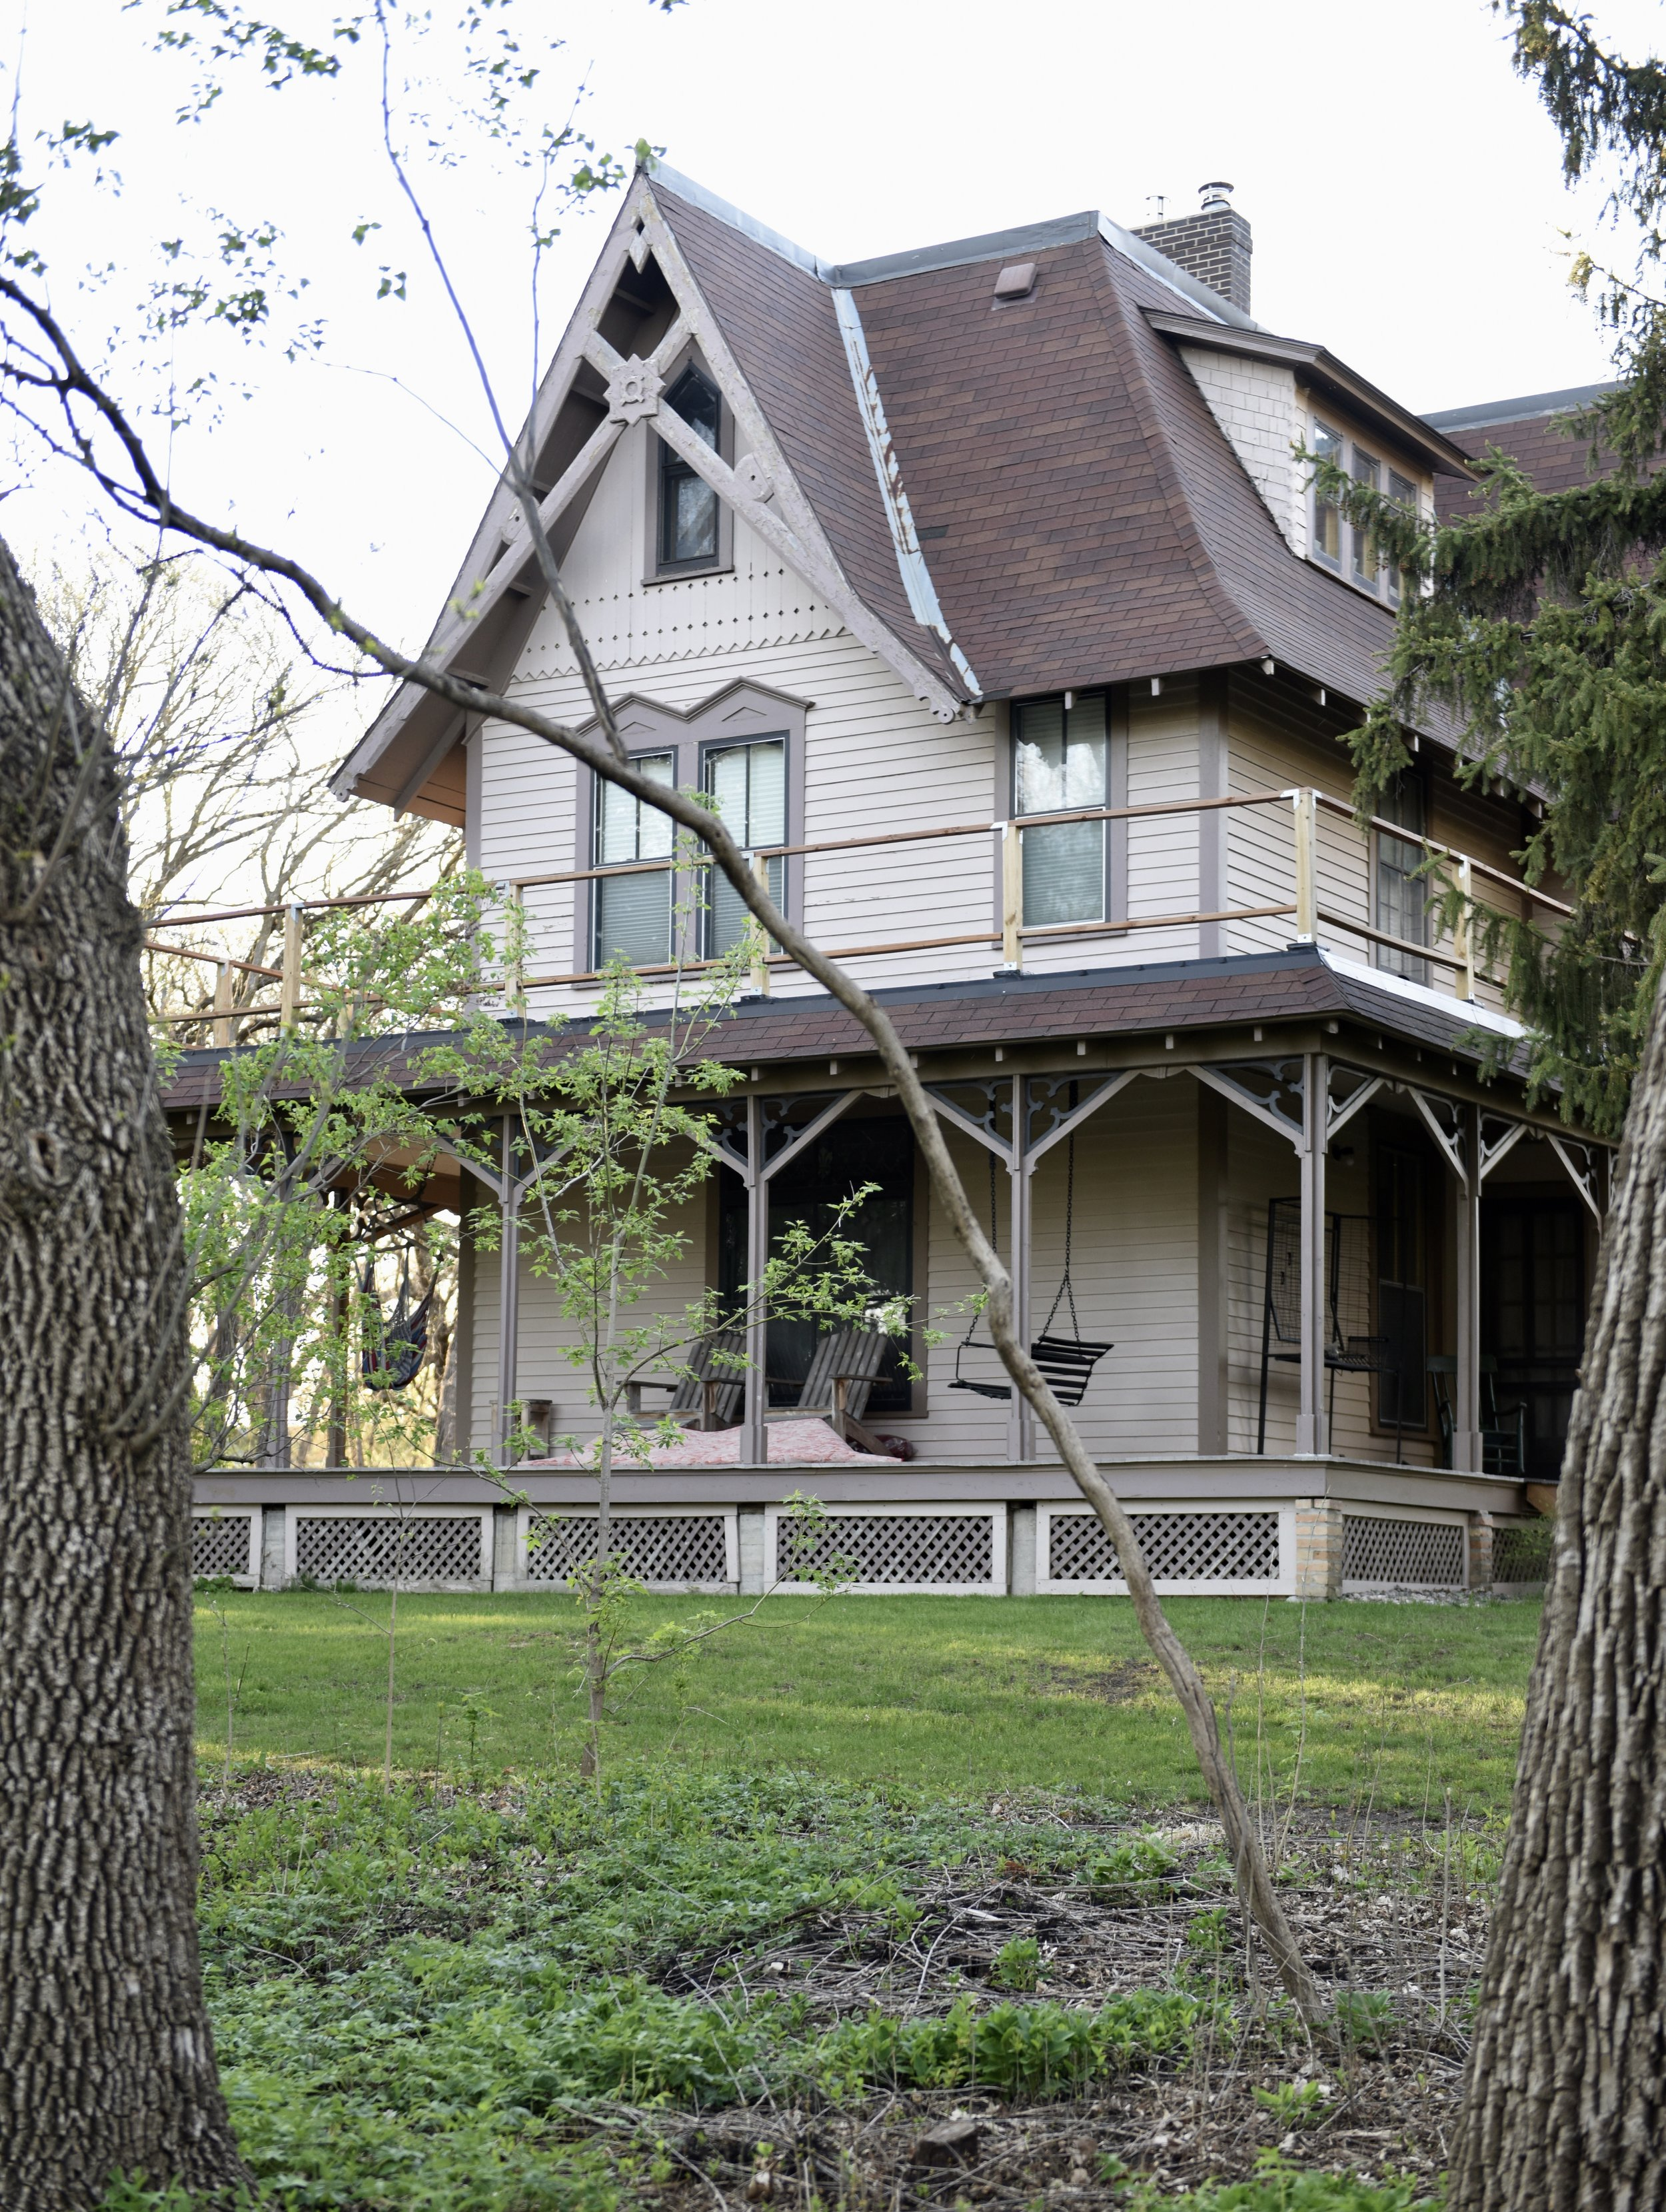 1882 C.J. Wright House